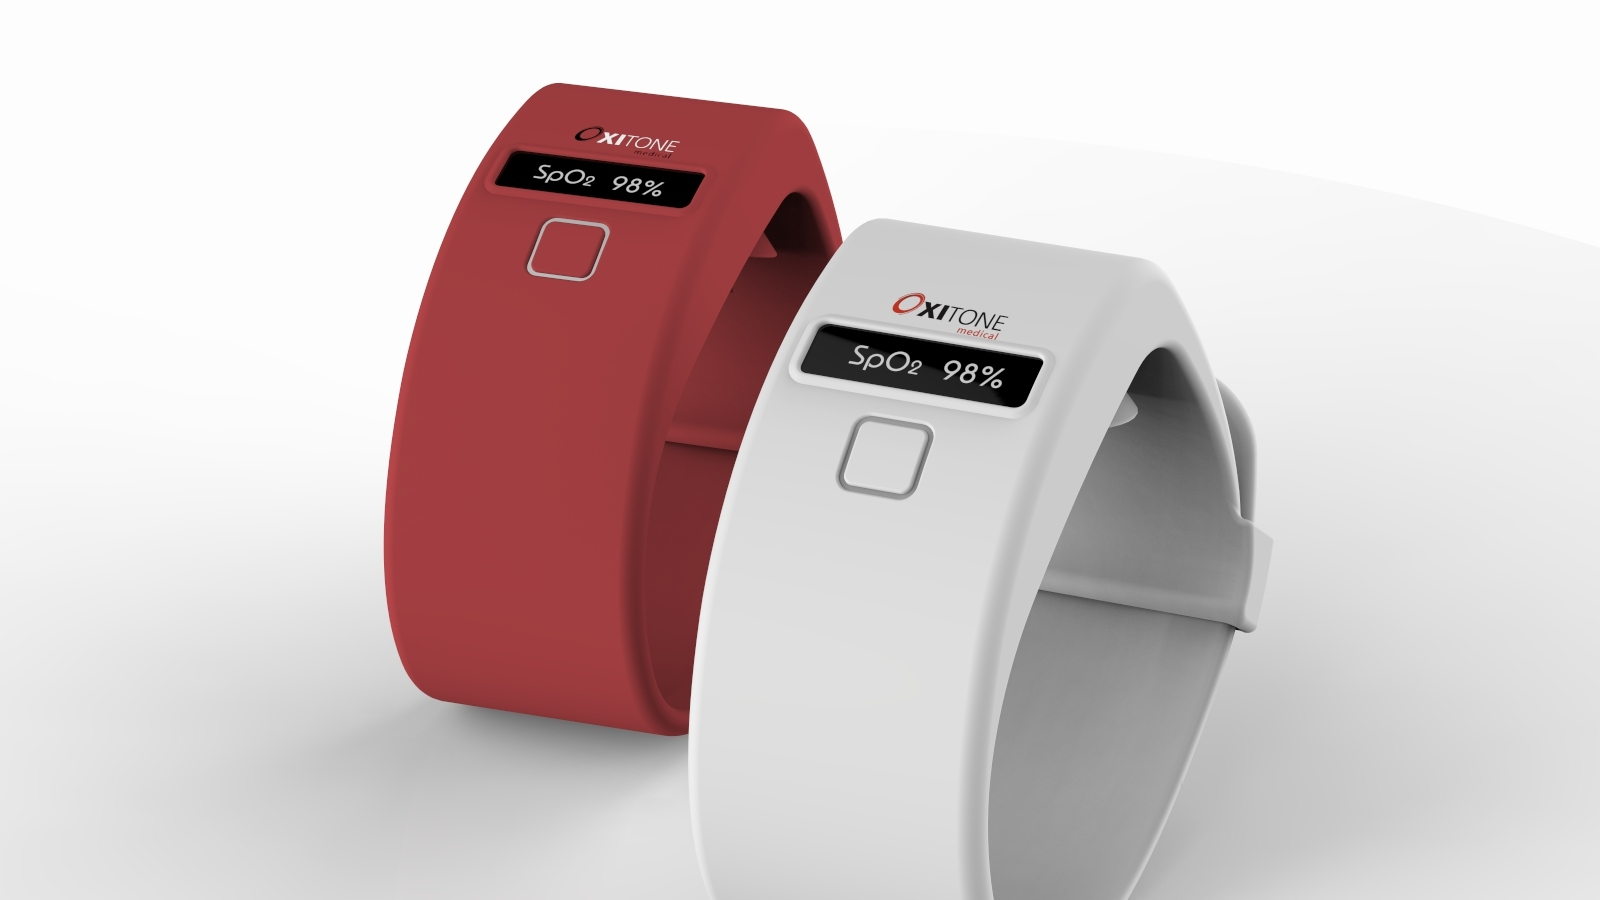 Oxitone's prototype blood-oxygen monitoring wearable. Photo: courtesy